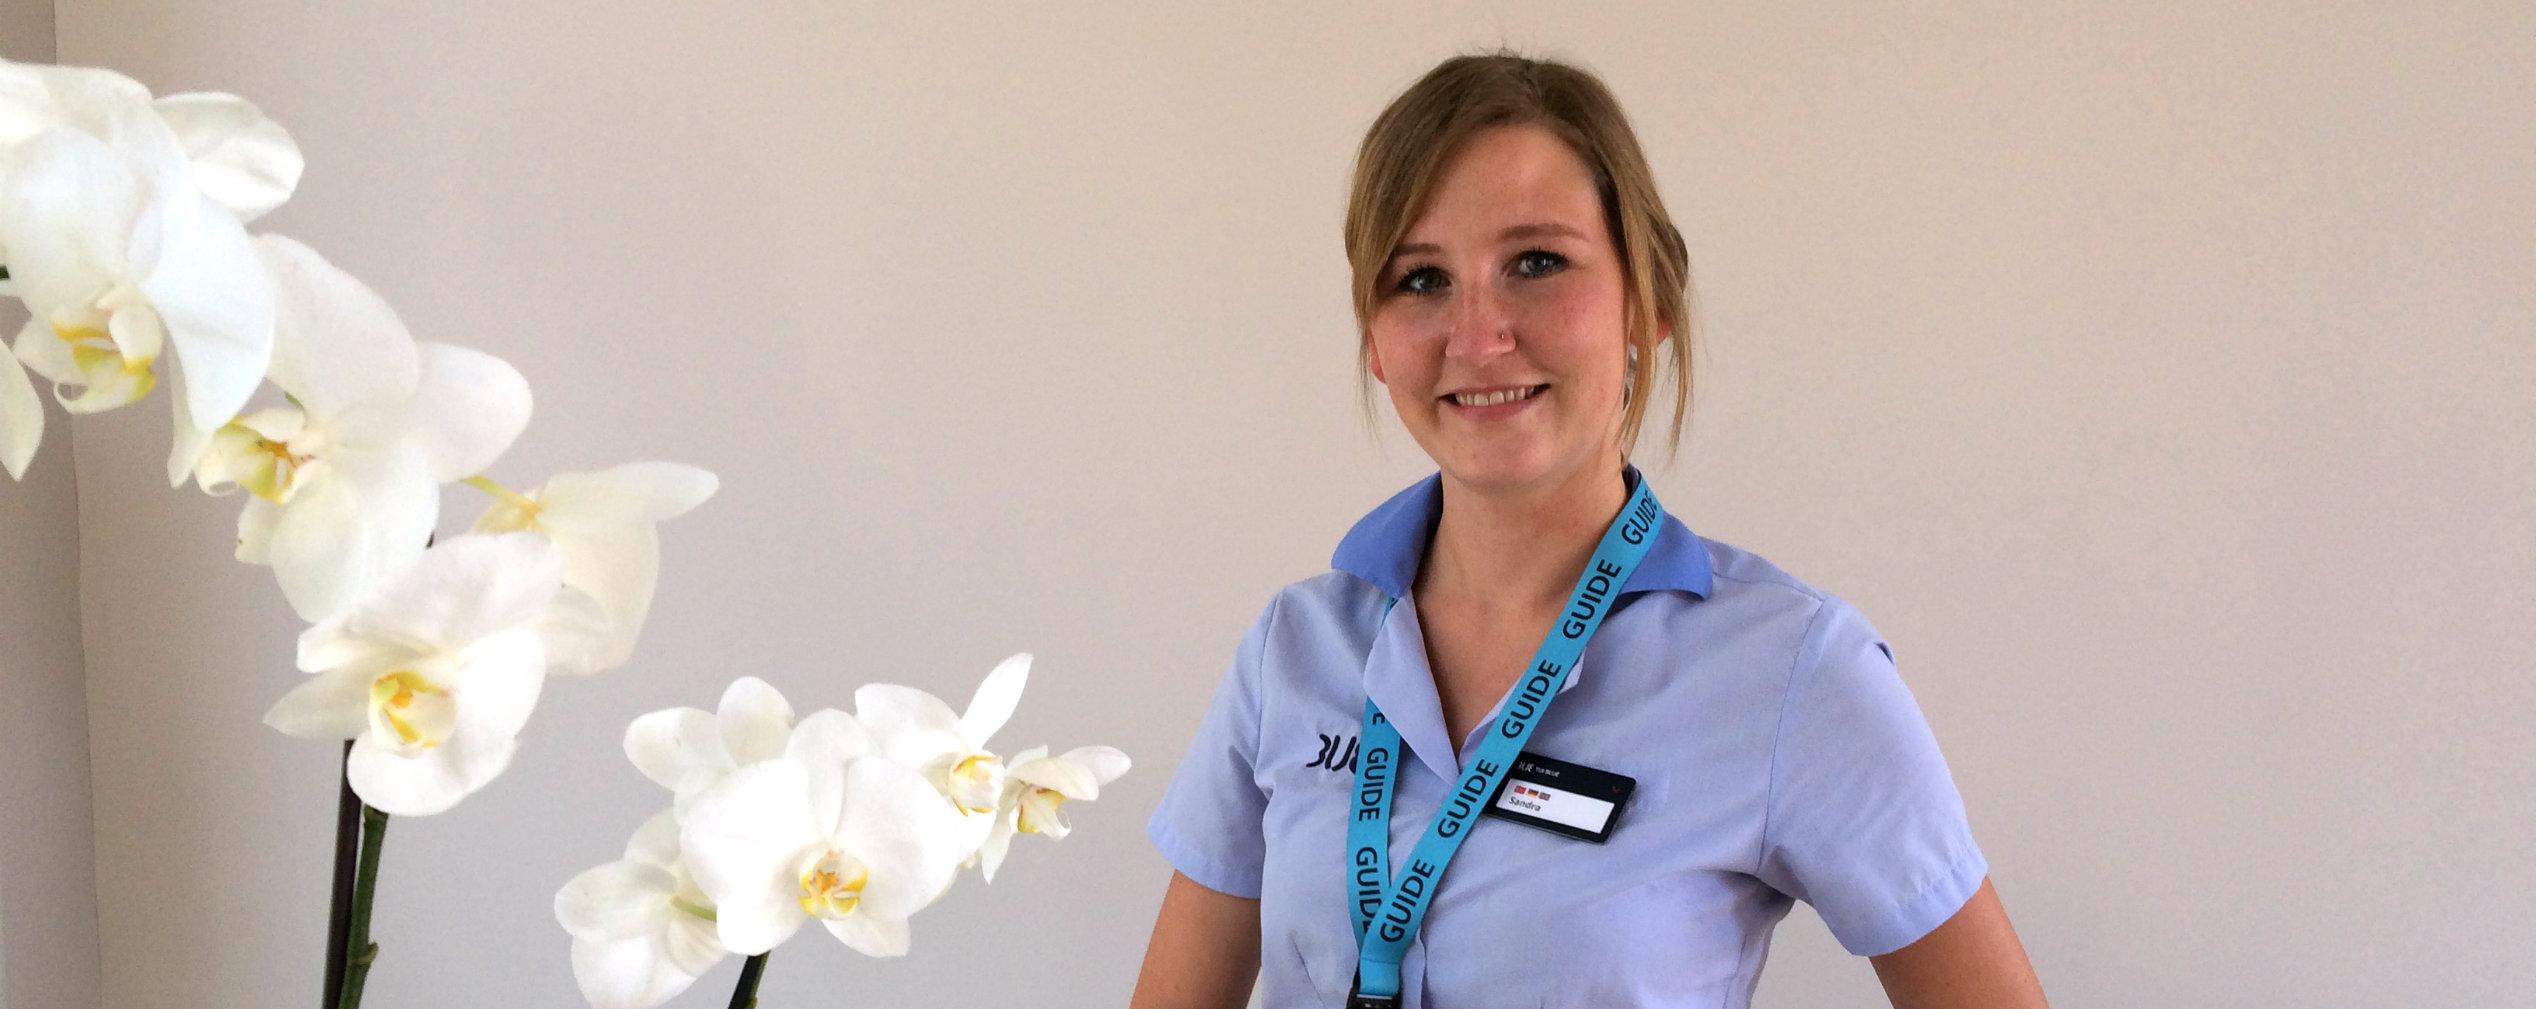 Sandra Cetin, BLUE Guide at TUI BLUE Palm Garden